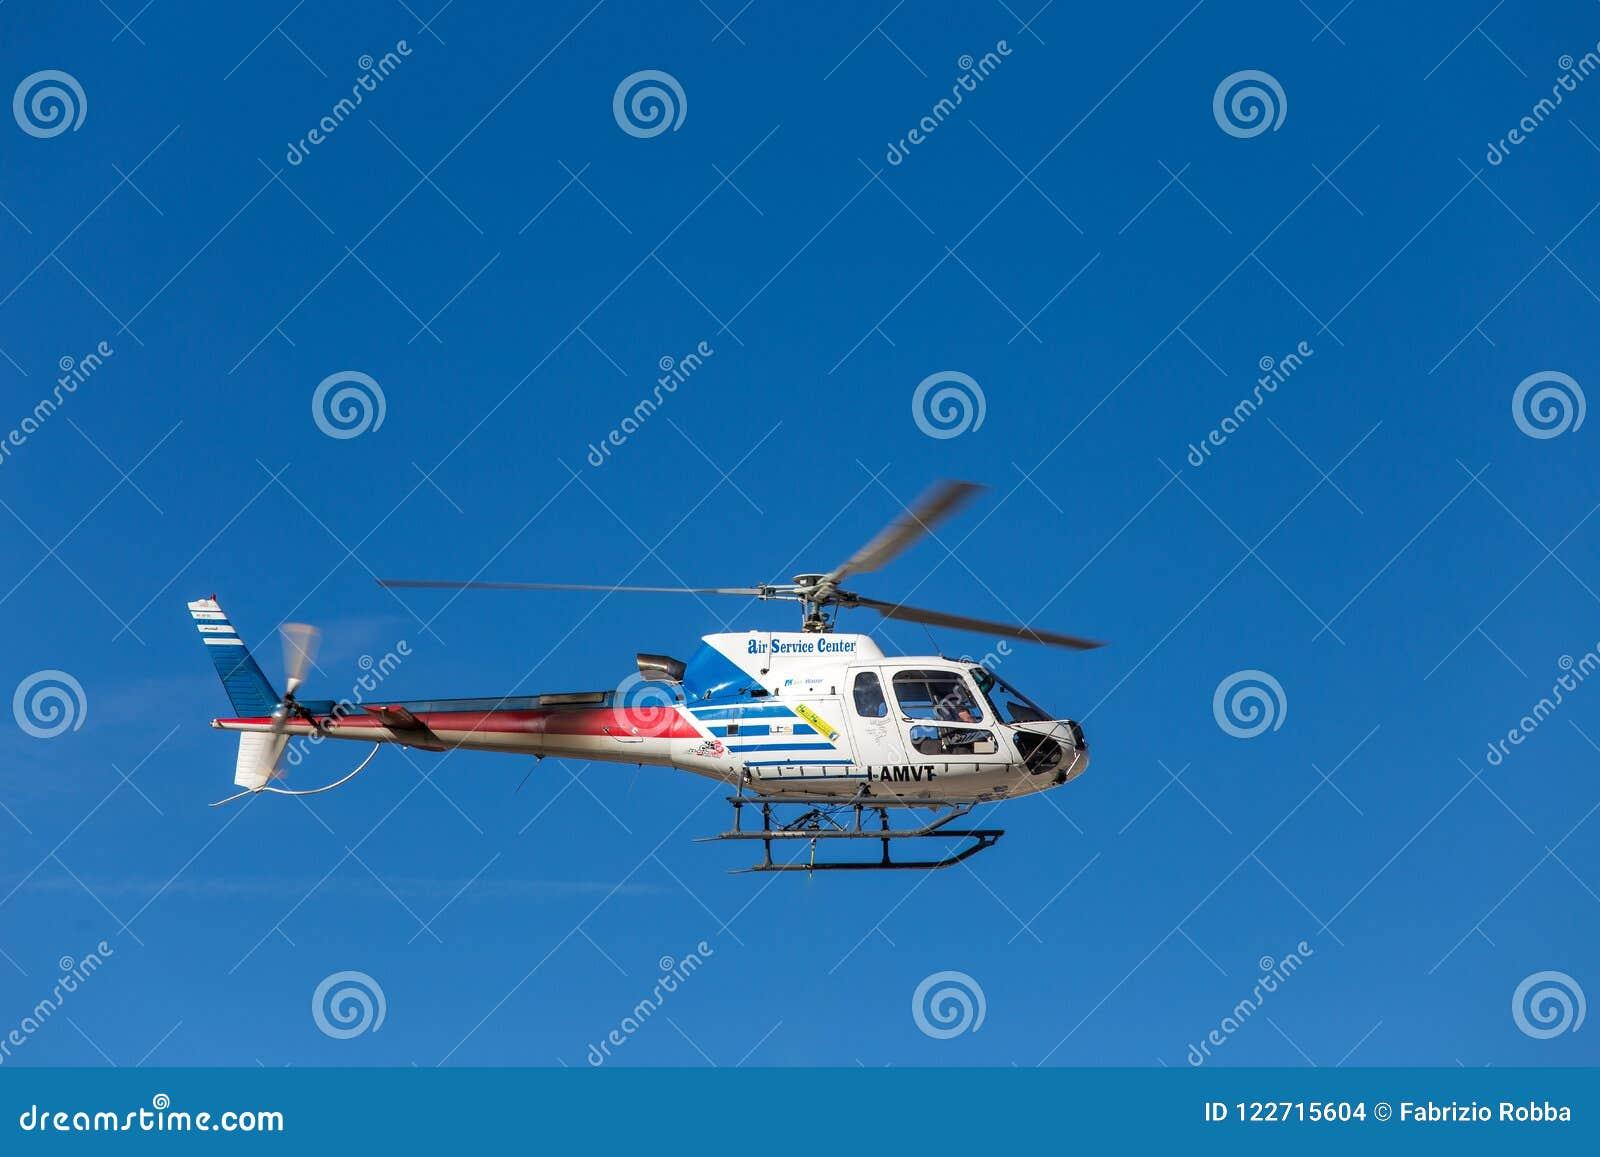 Falzarego通行证,意大利, 2017年10月19日- Elicopter Falzarego山通过的飞行aorund 白云岩,意大利